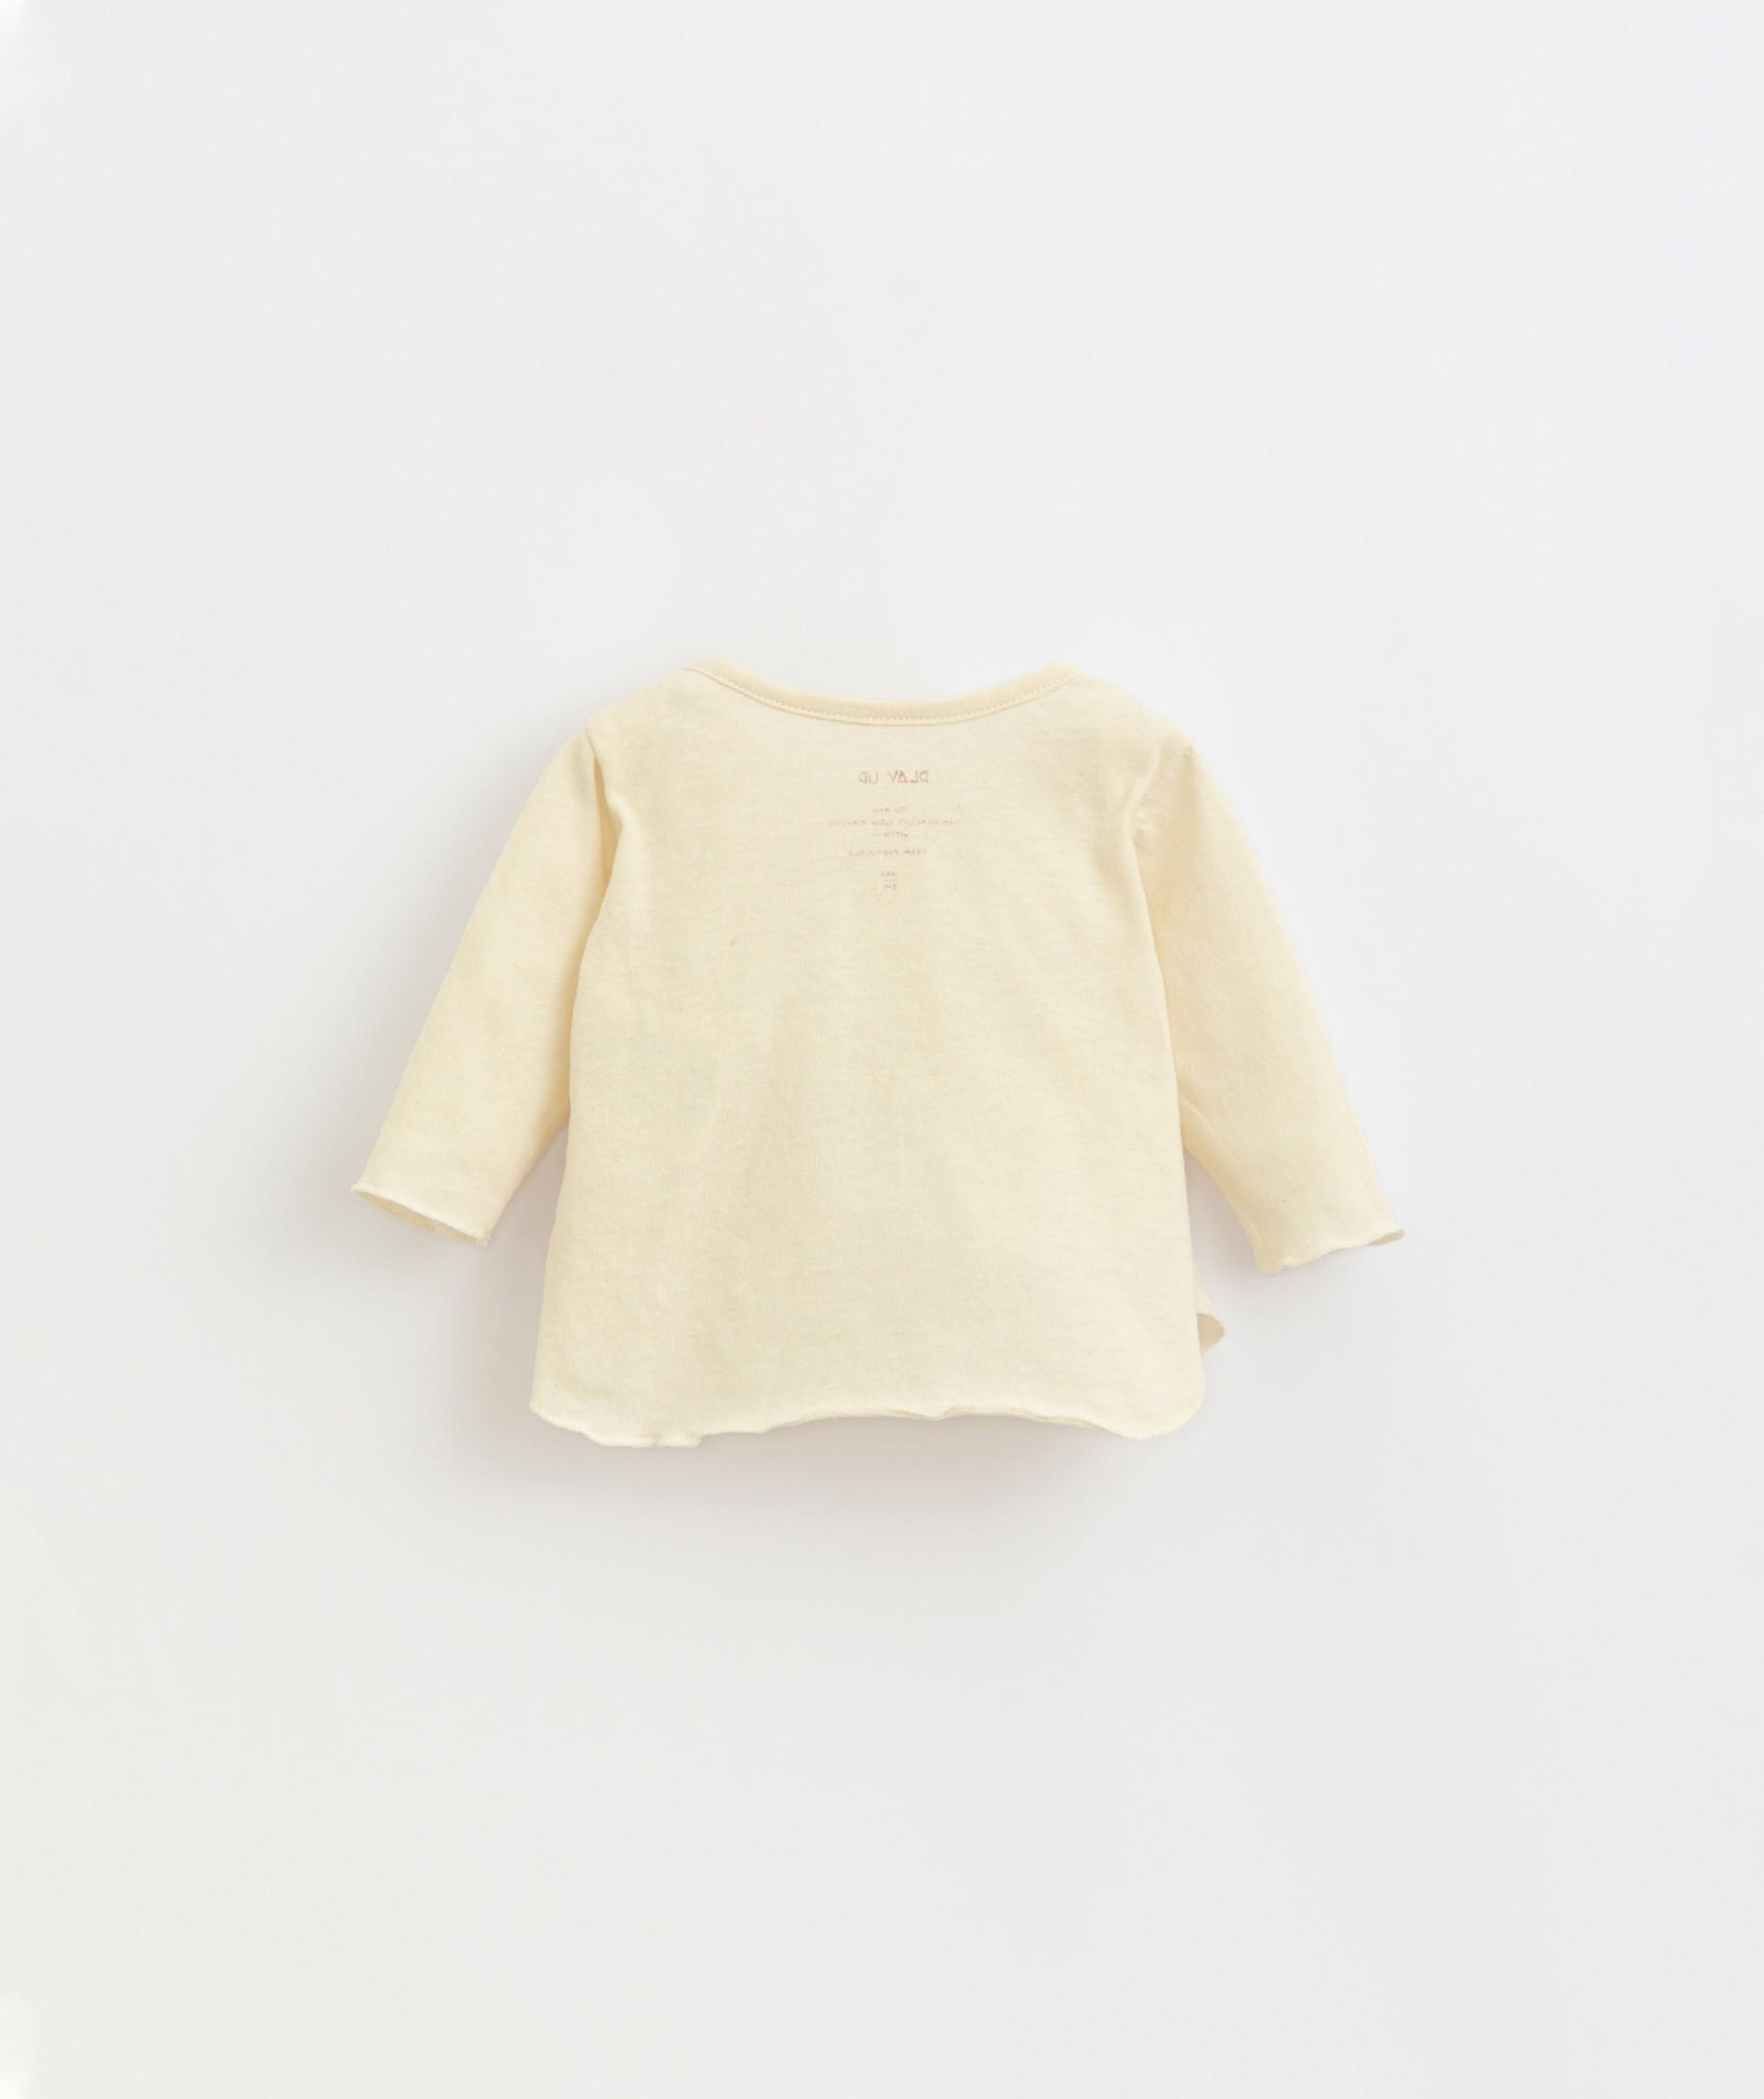 T-shirt with a pocket | Botany